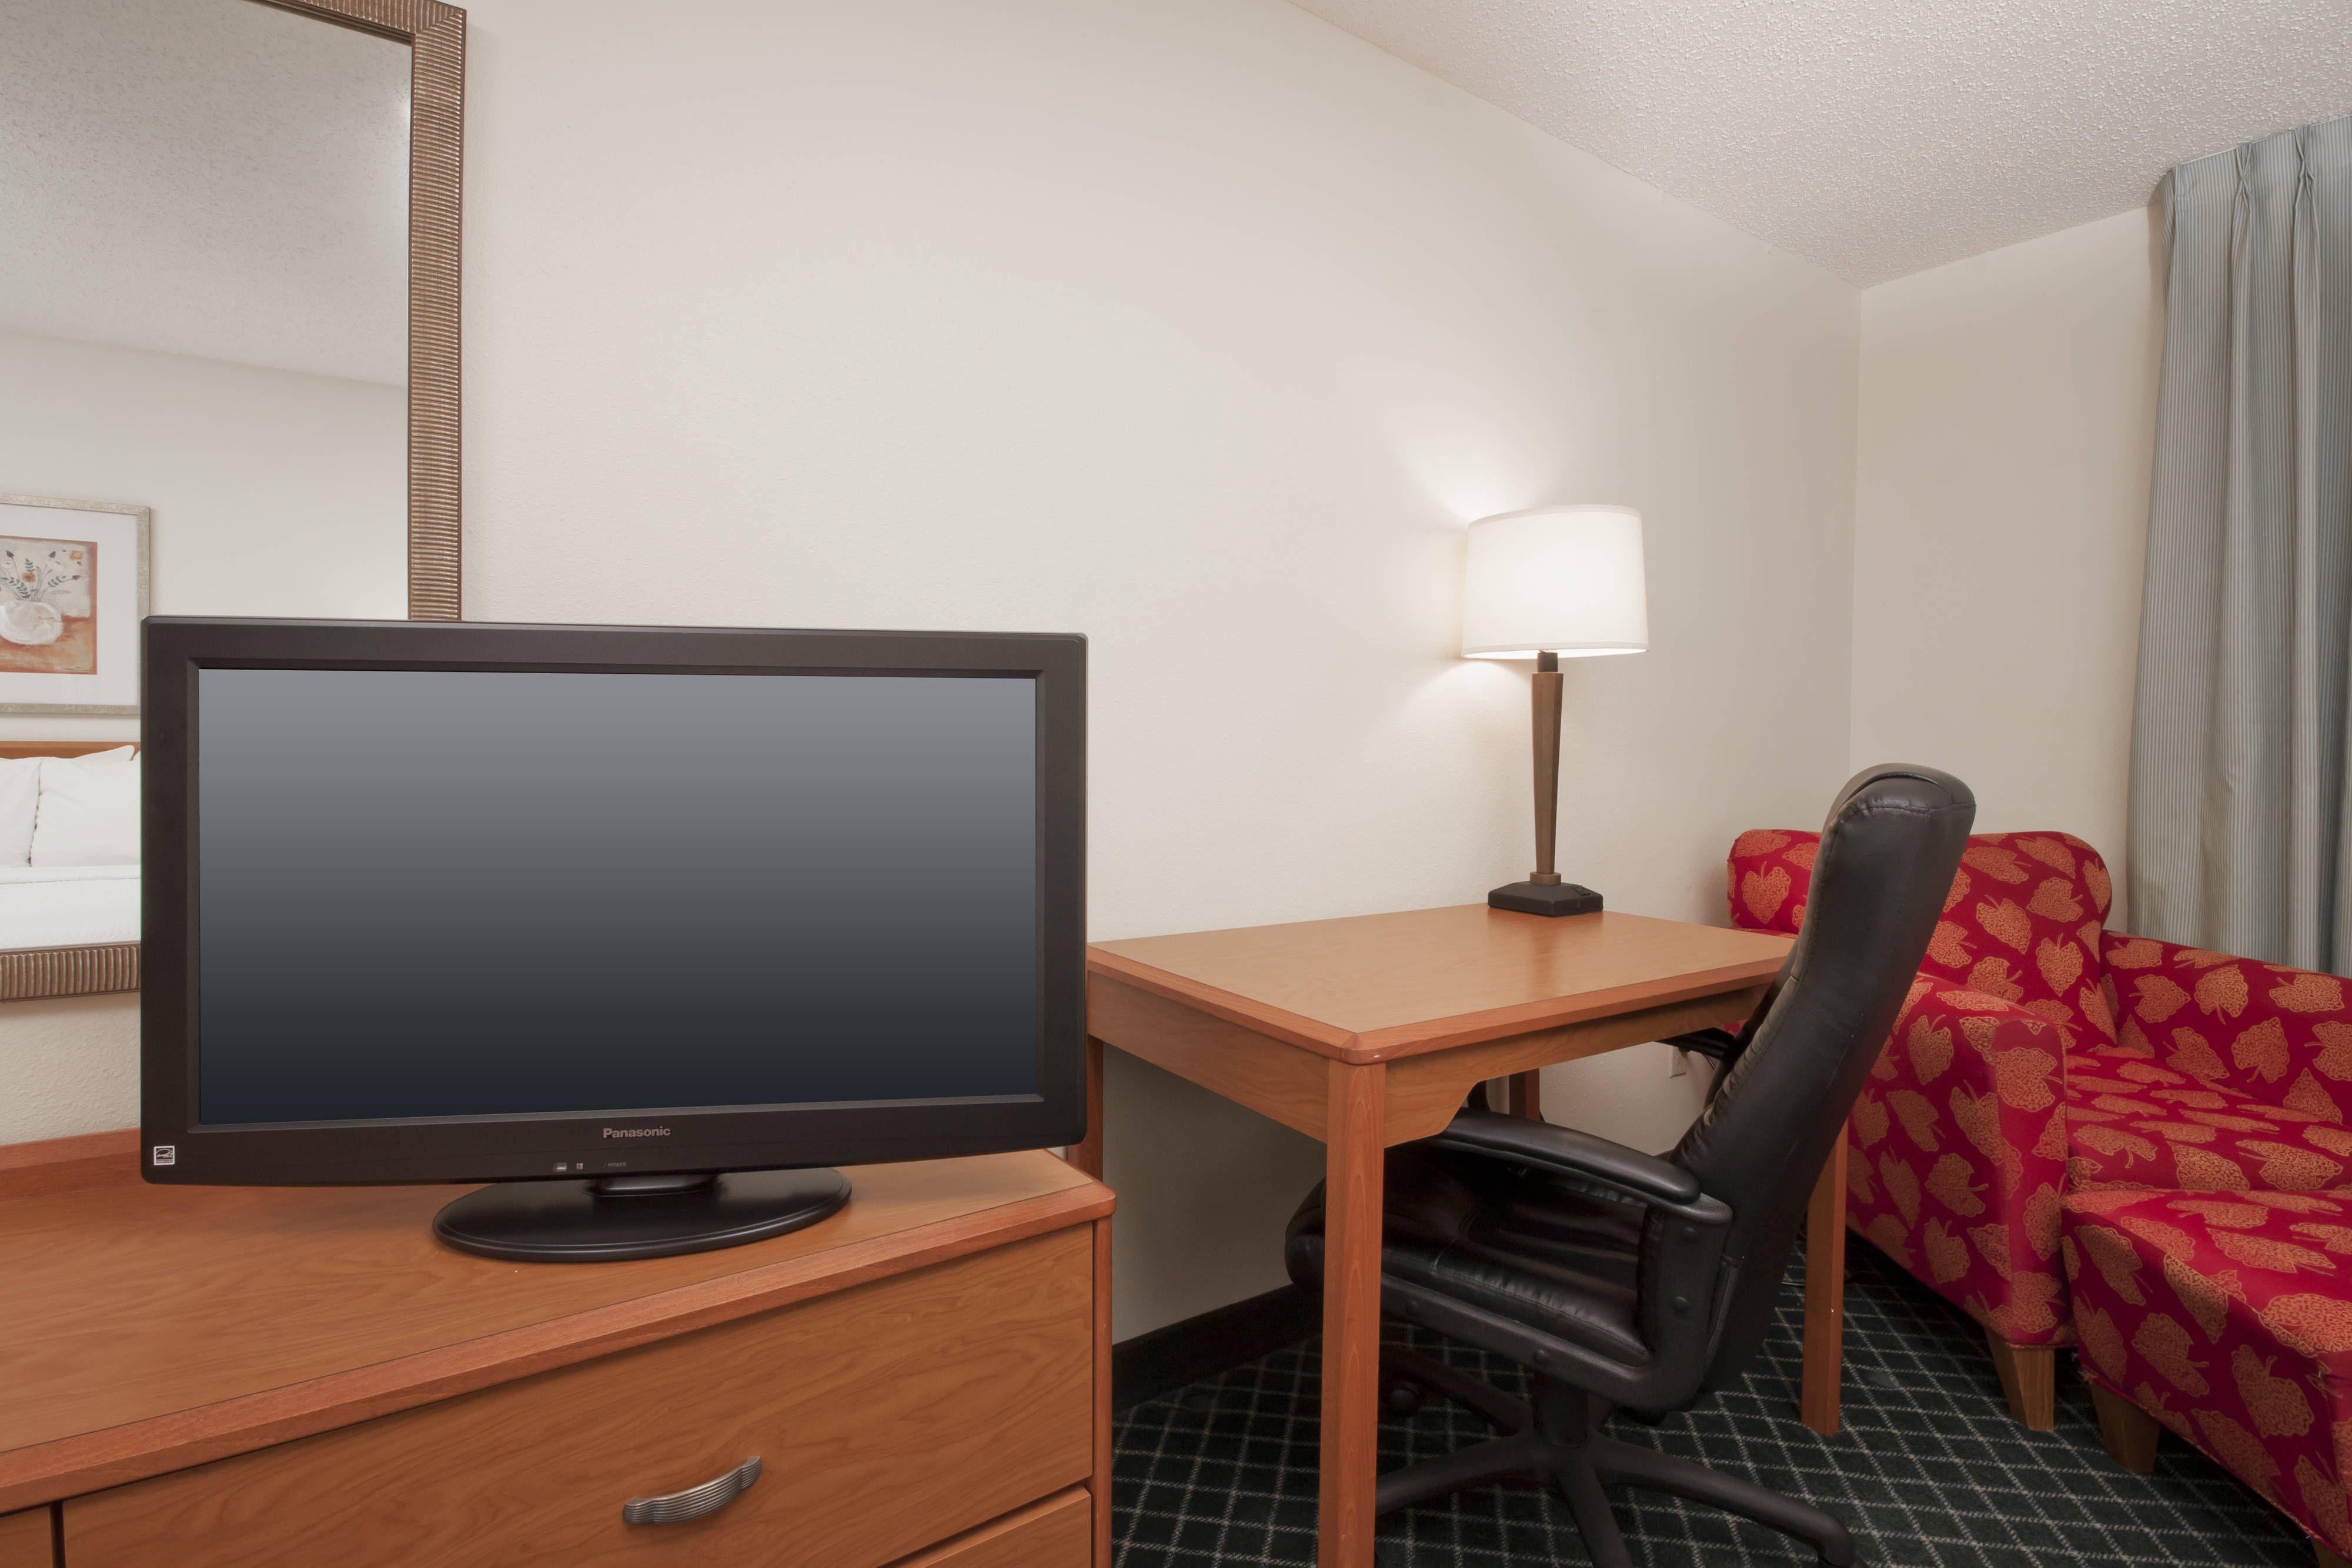 Fairfield Inn Davenport Queen Queen Guest Room Amenities